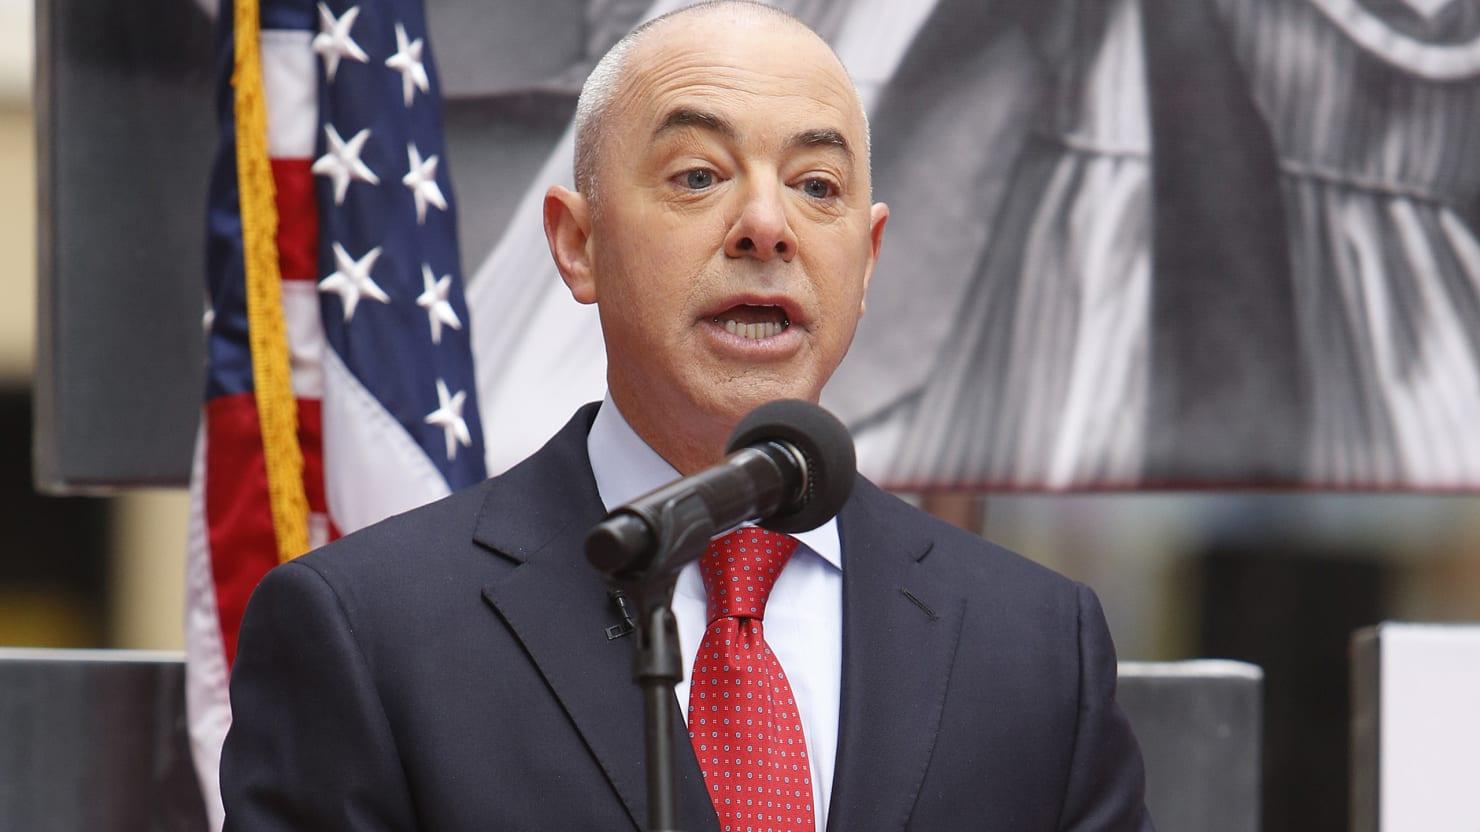 Alejandro Mayorkas's DHS Nomination Held Up Over IG Investigation